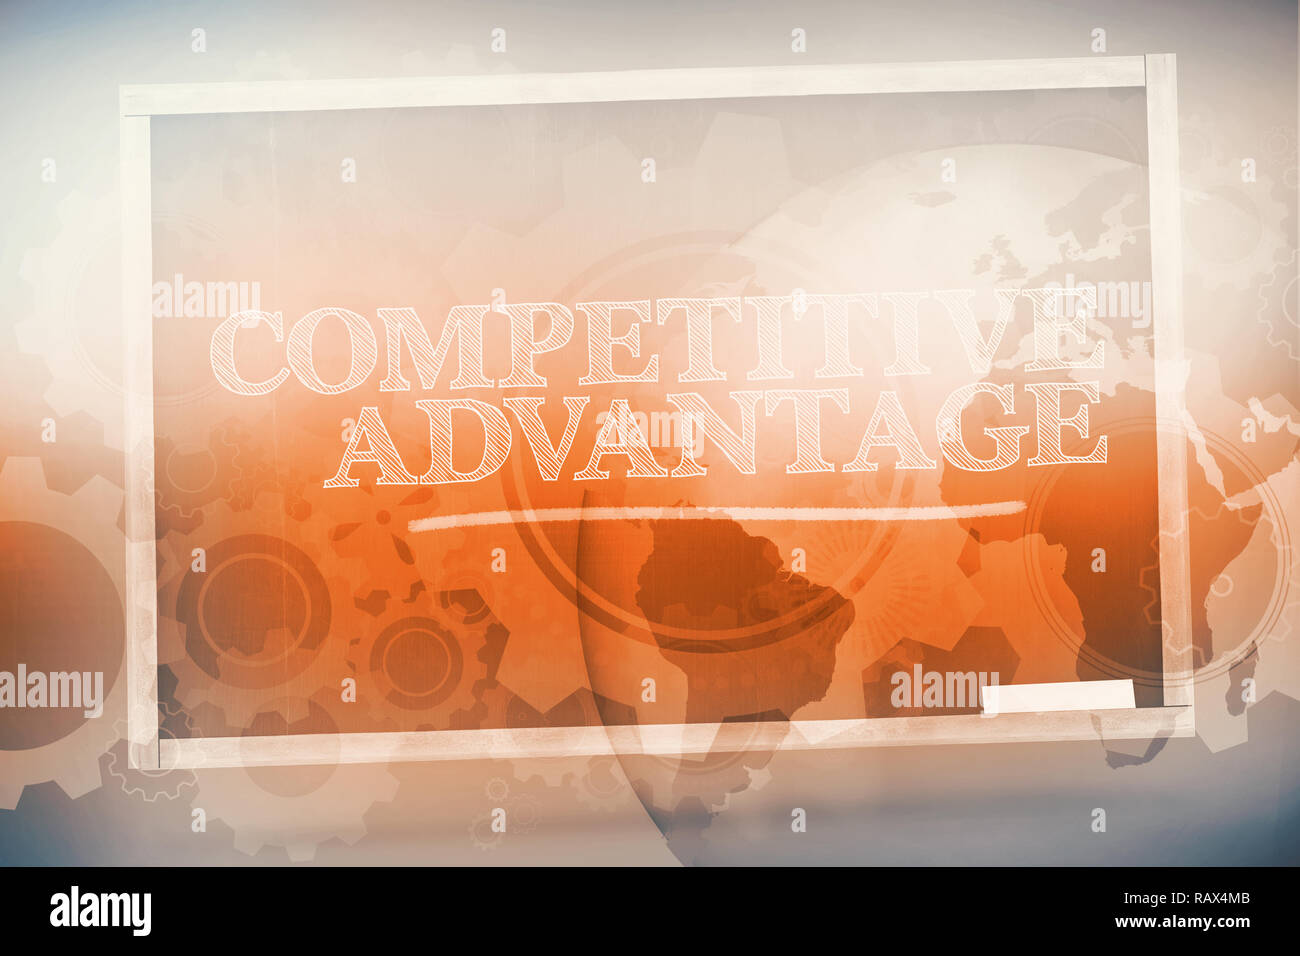 Competitive advantage written on a chalkboard - Stock Image